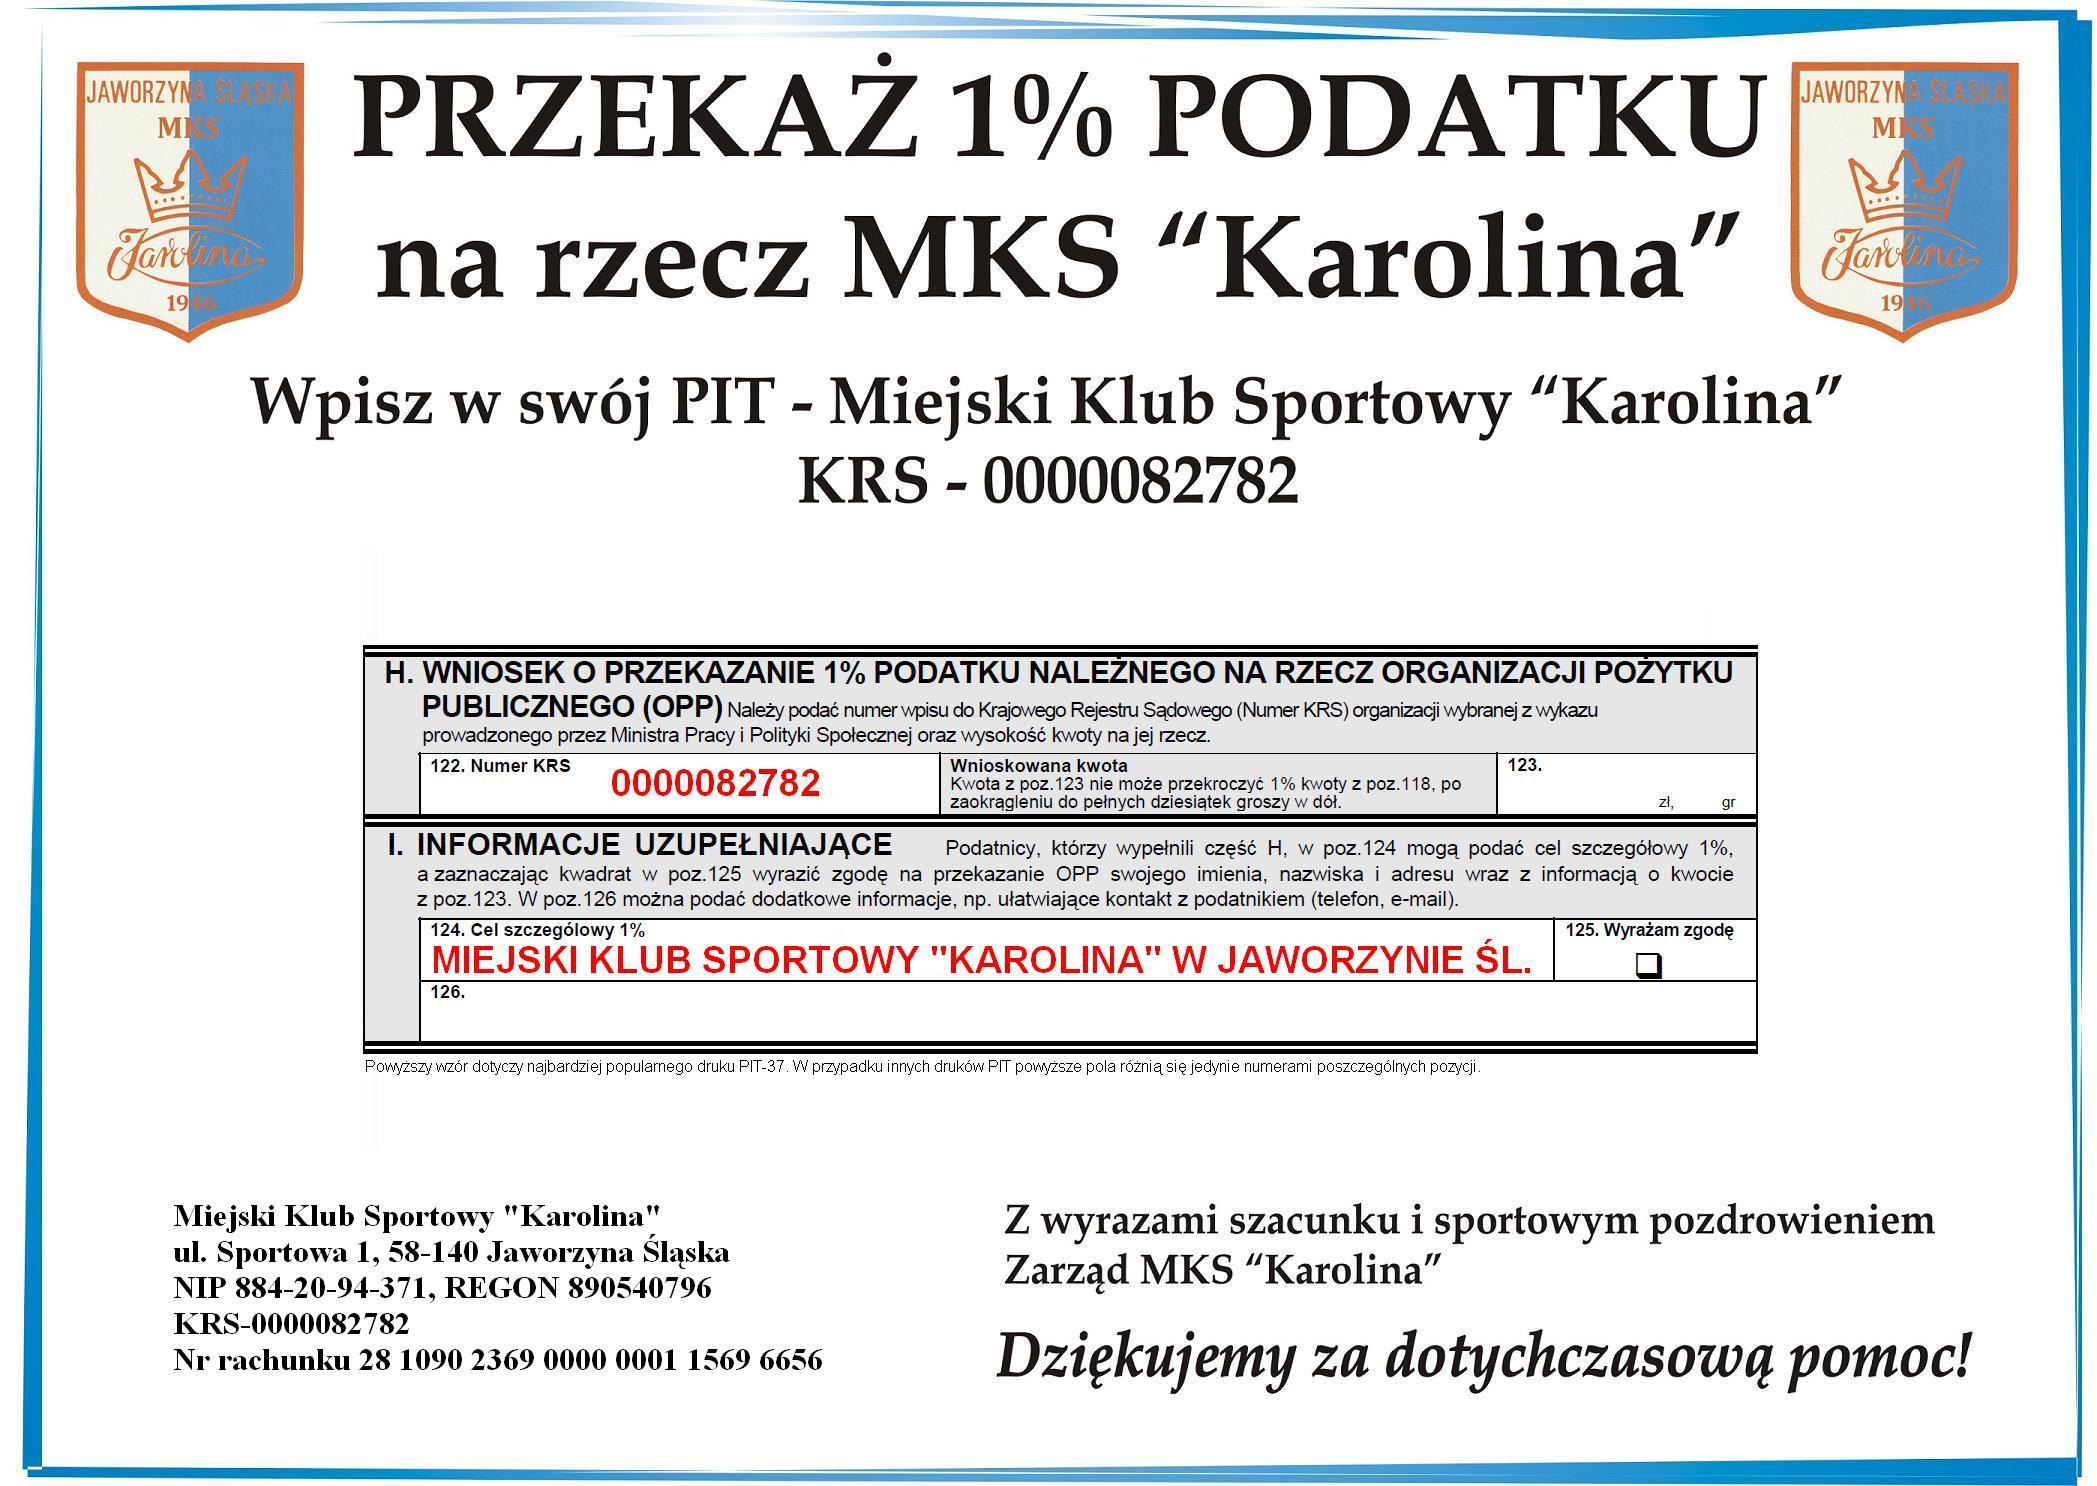 mks1pro